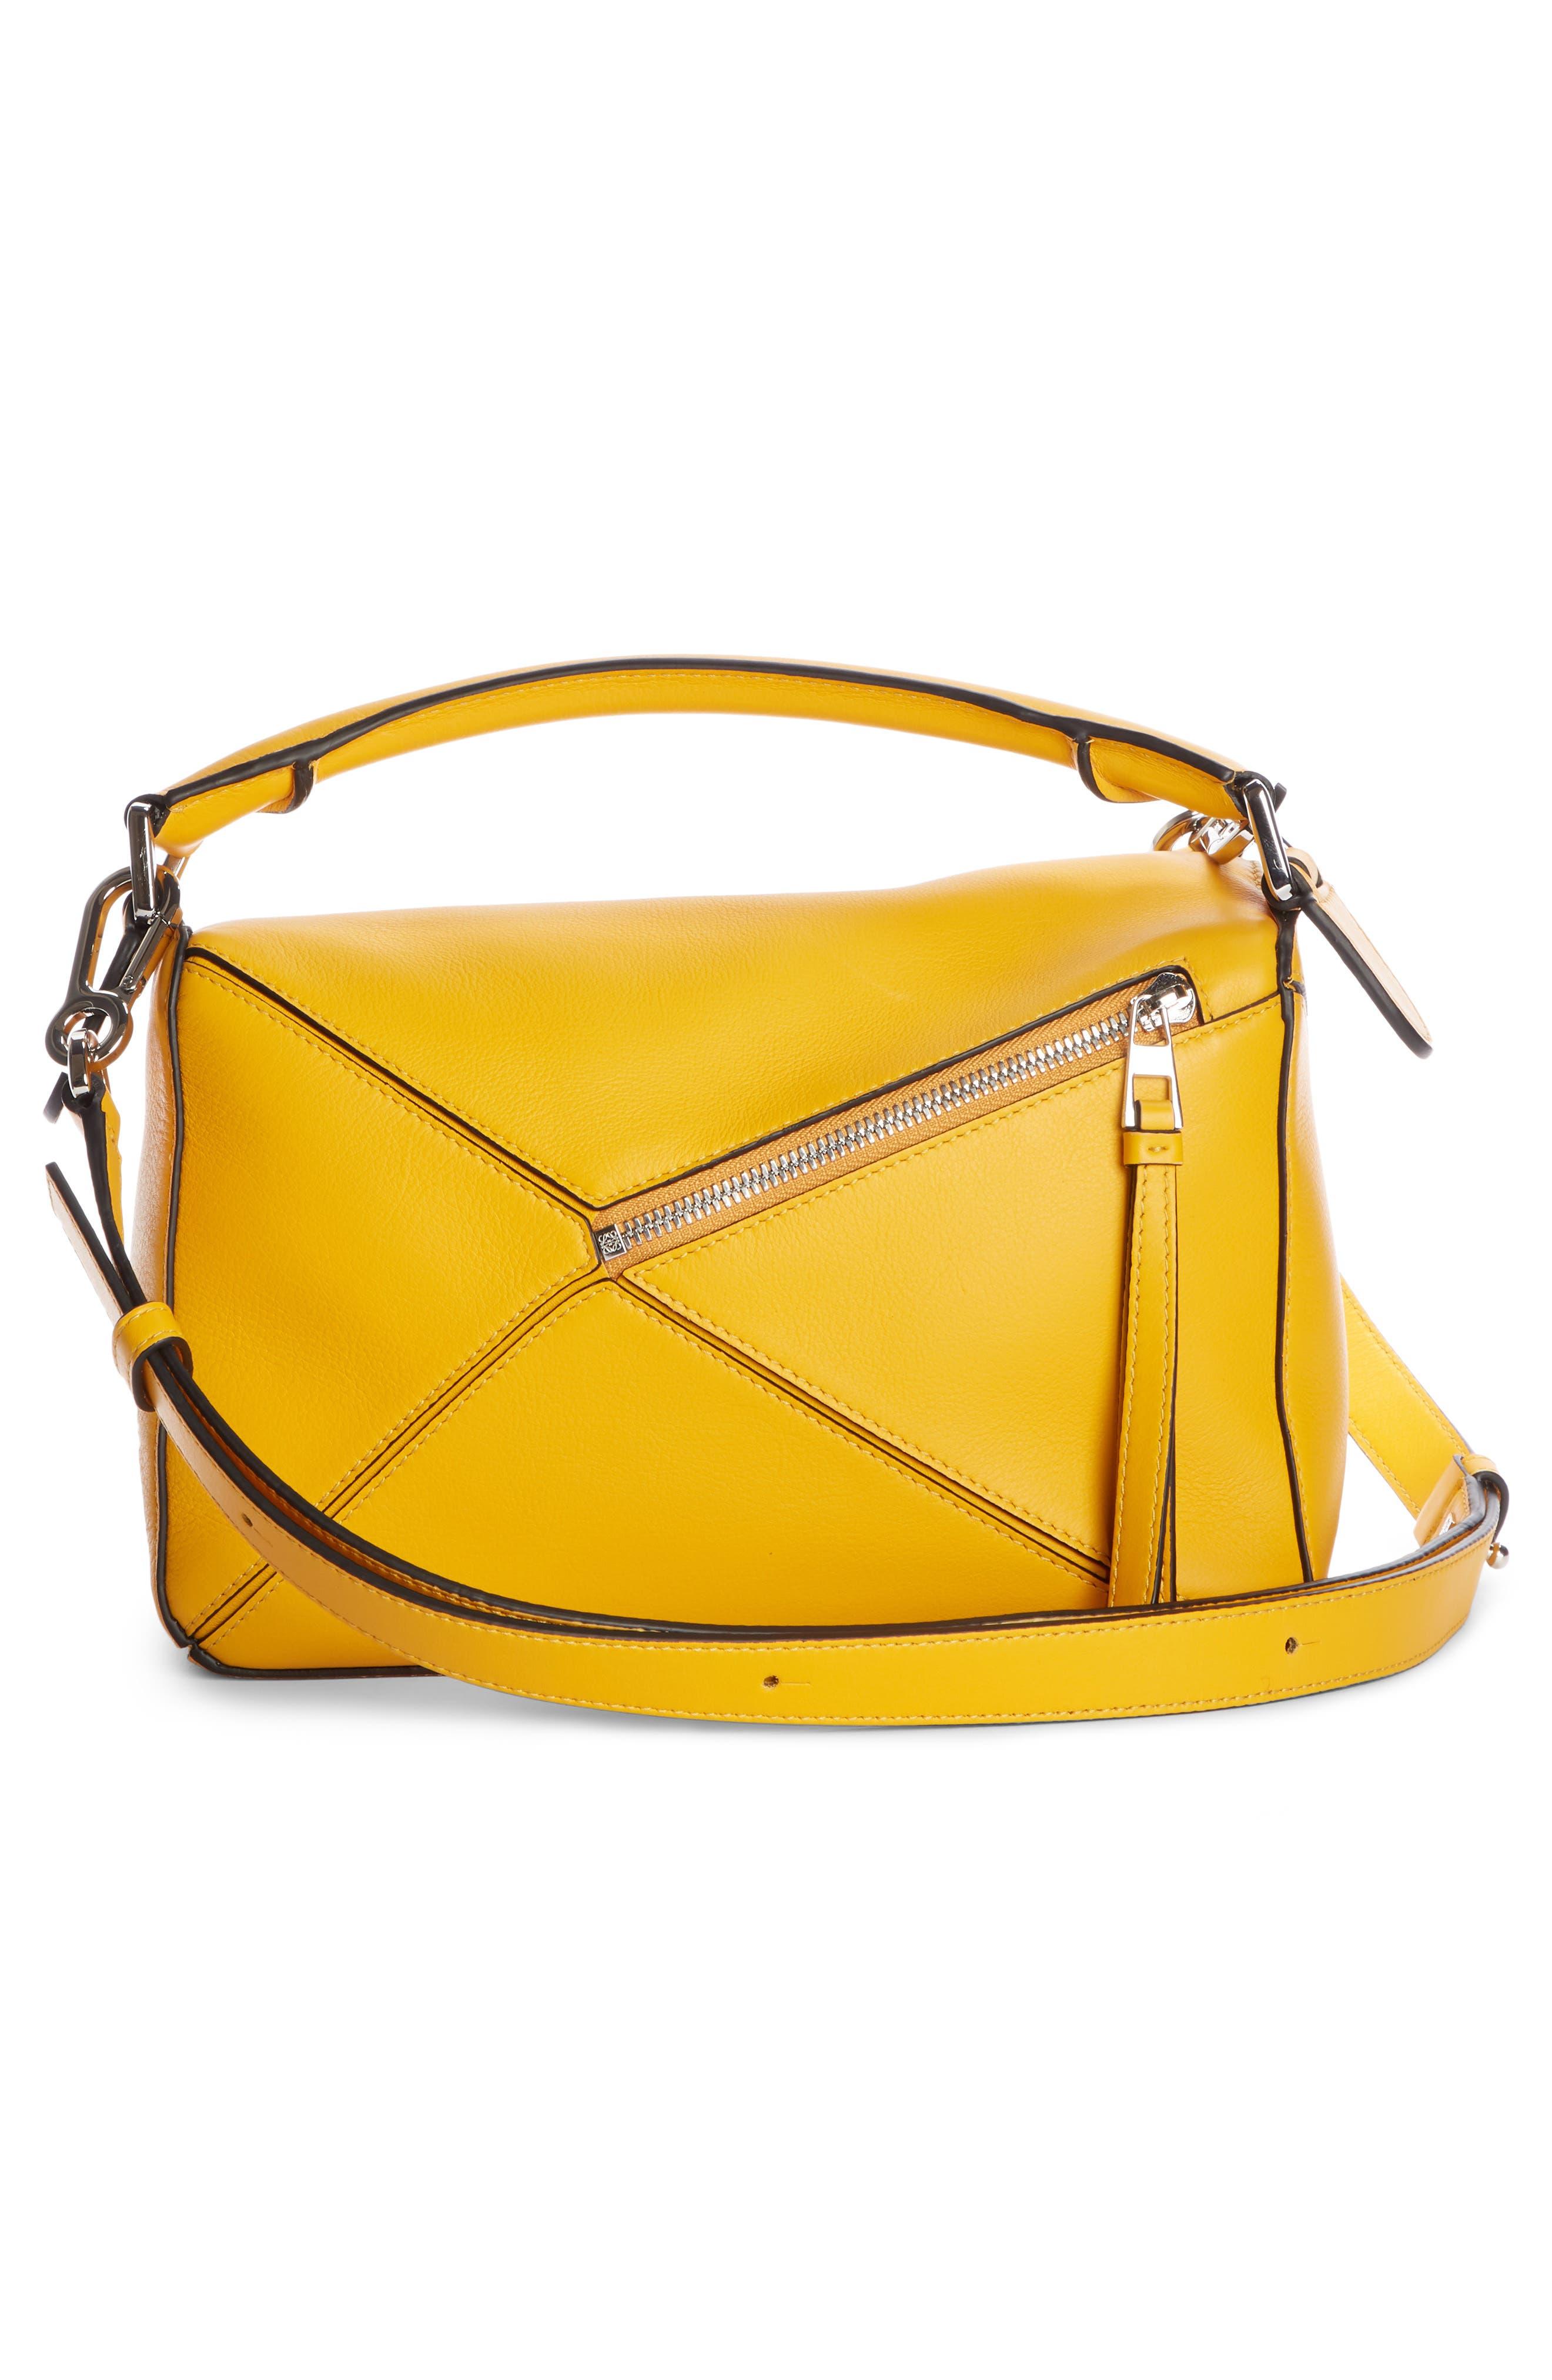 LOEWE,                             Small Puzzle Shoulder Bag,                             Alternate thumbnail 4, color,                             YELLOW MANGO